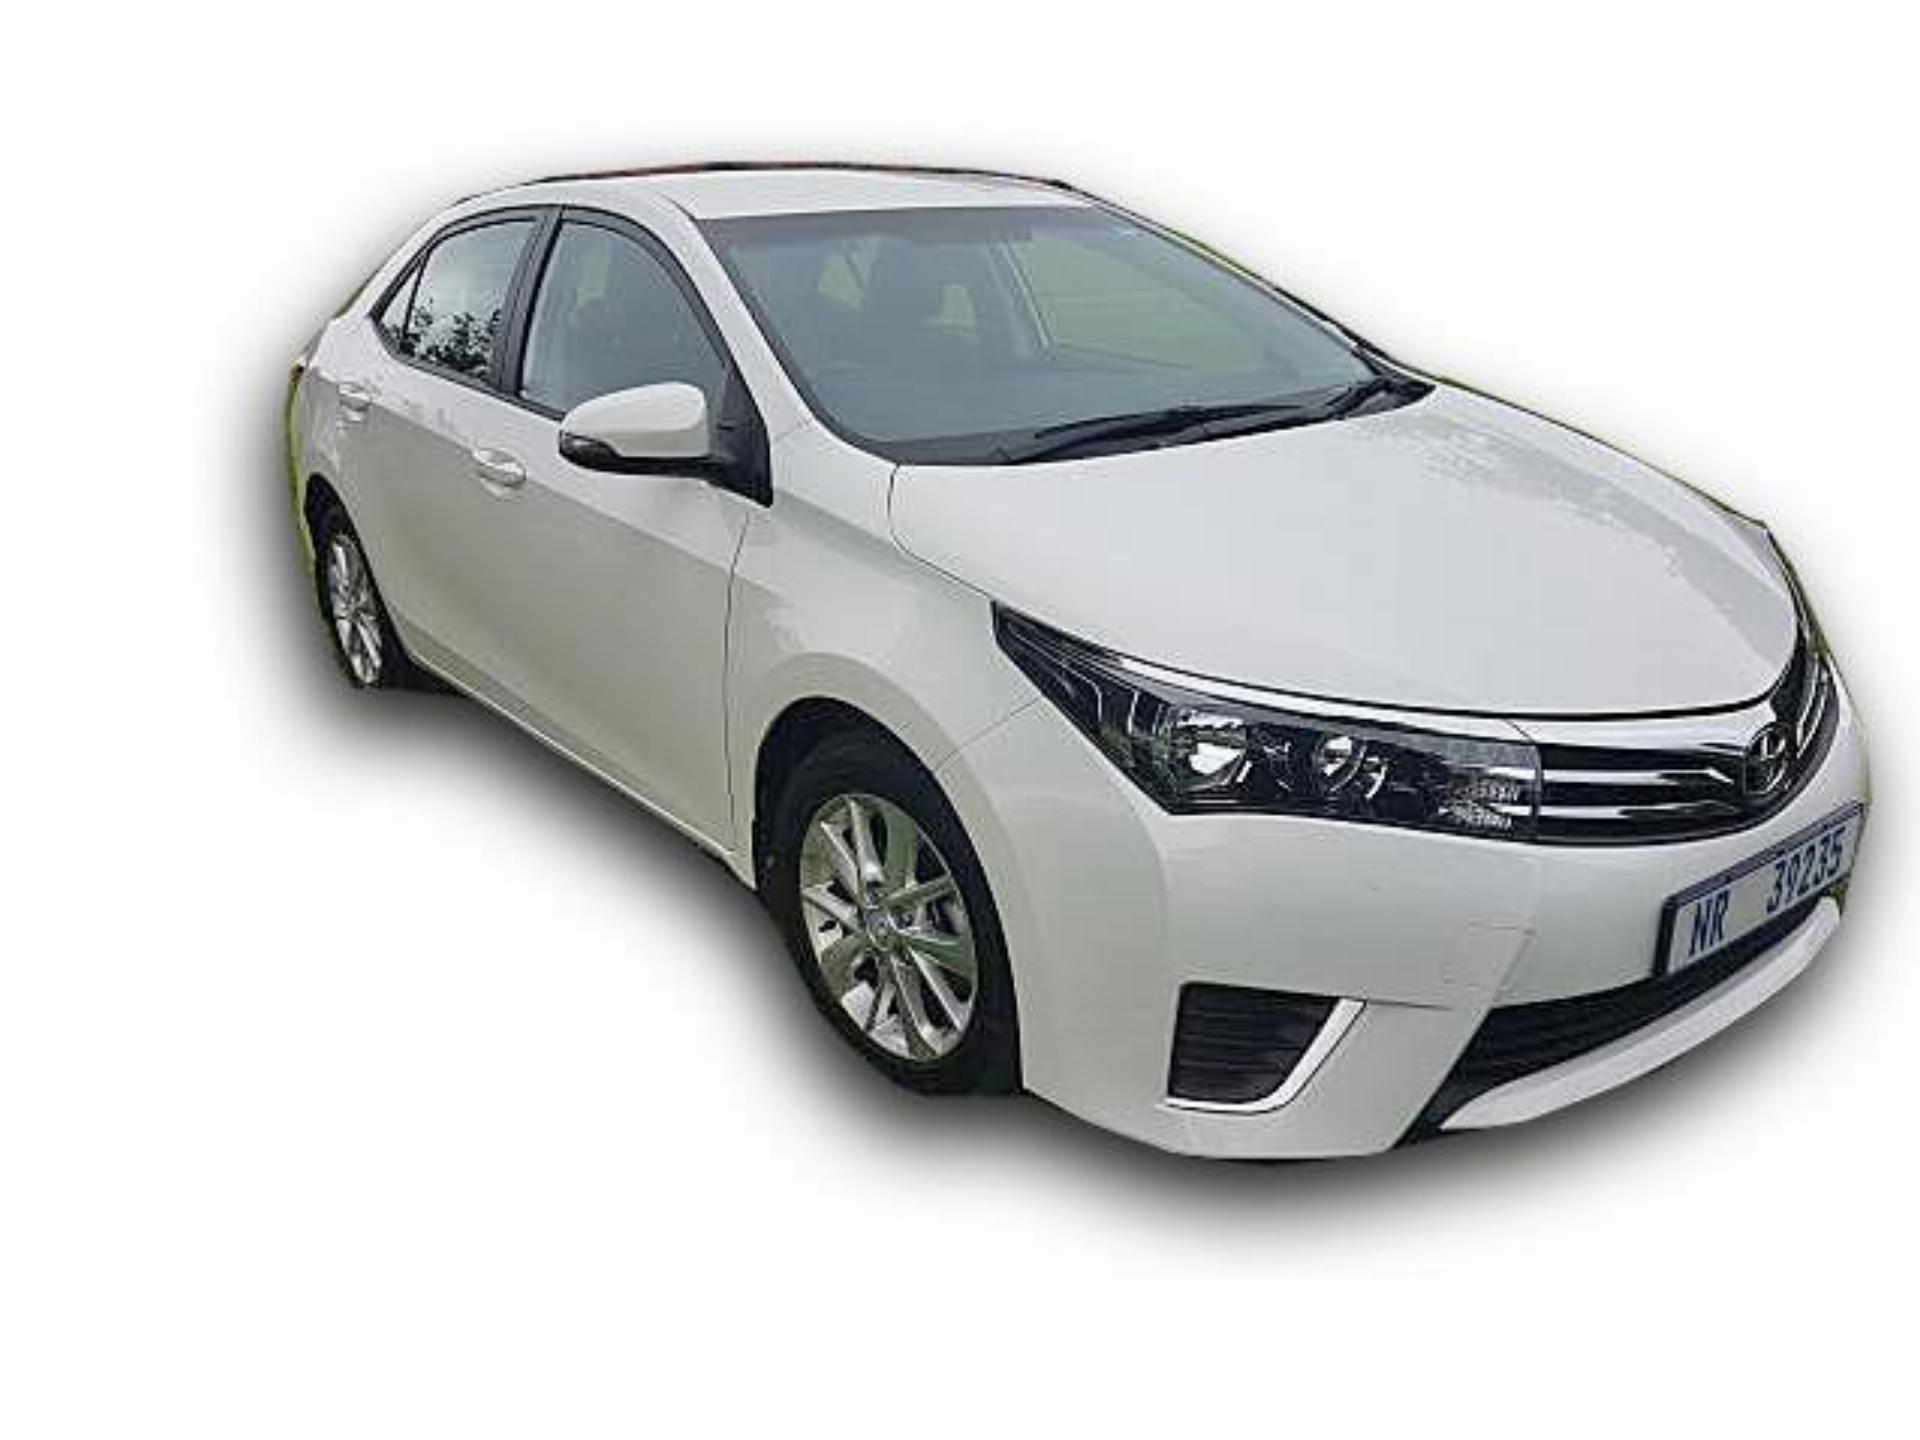 Toyota Corolla 1.4D Prestige - Sedan